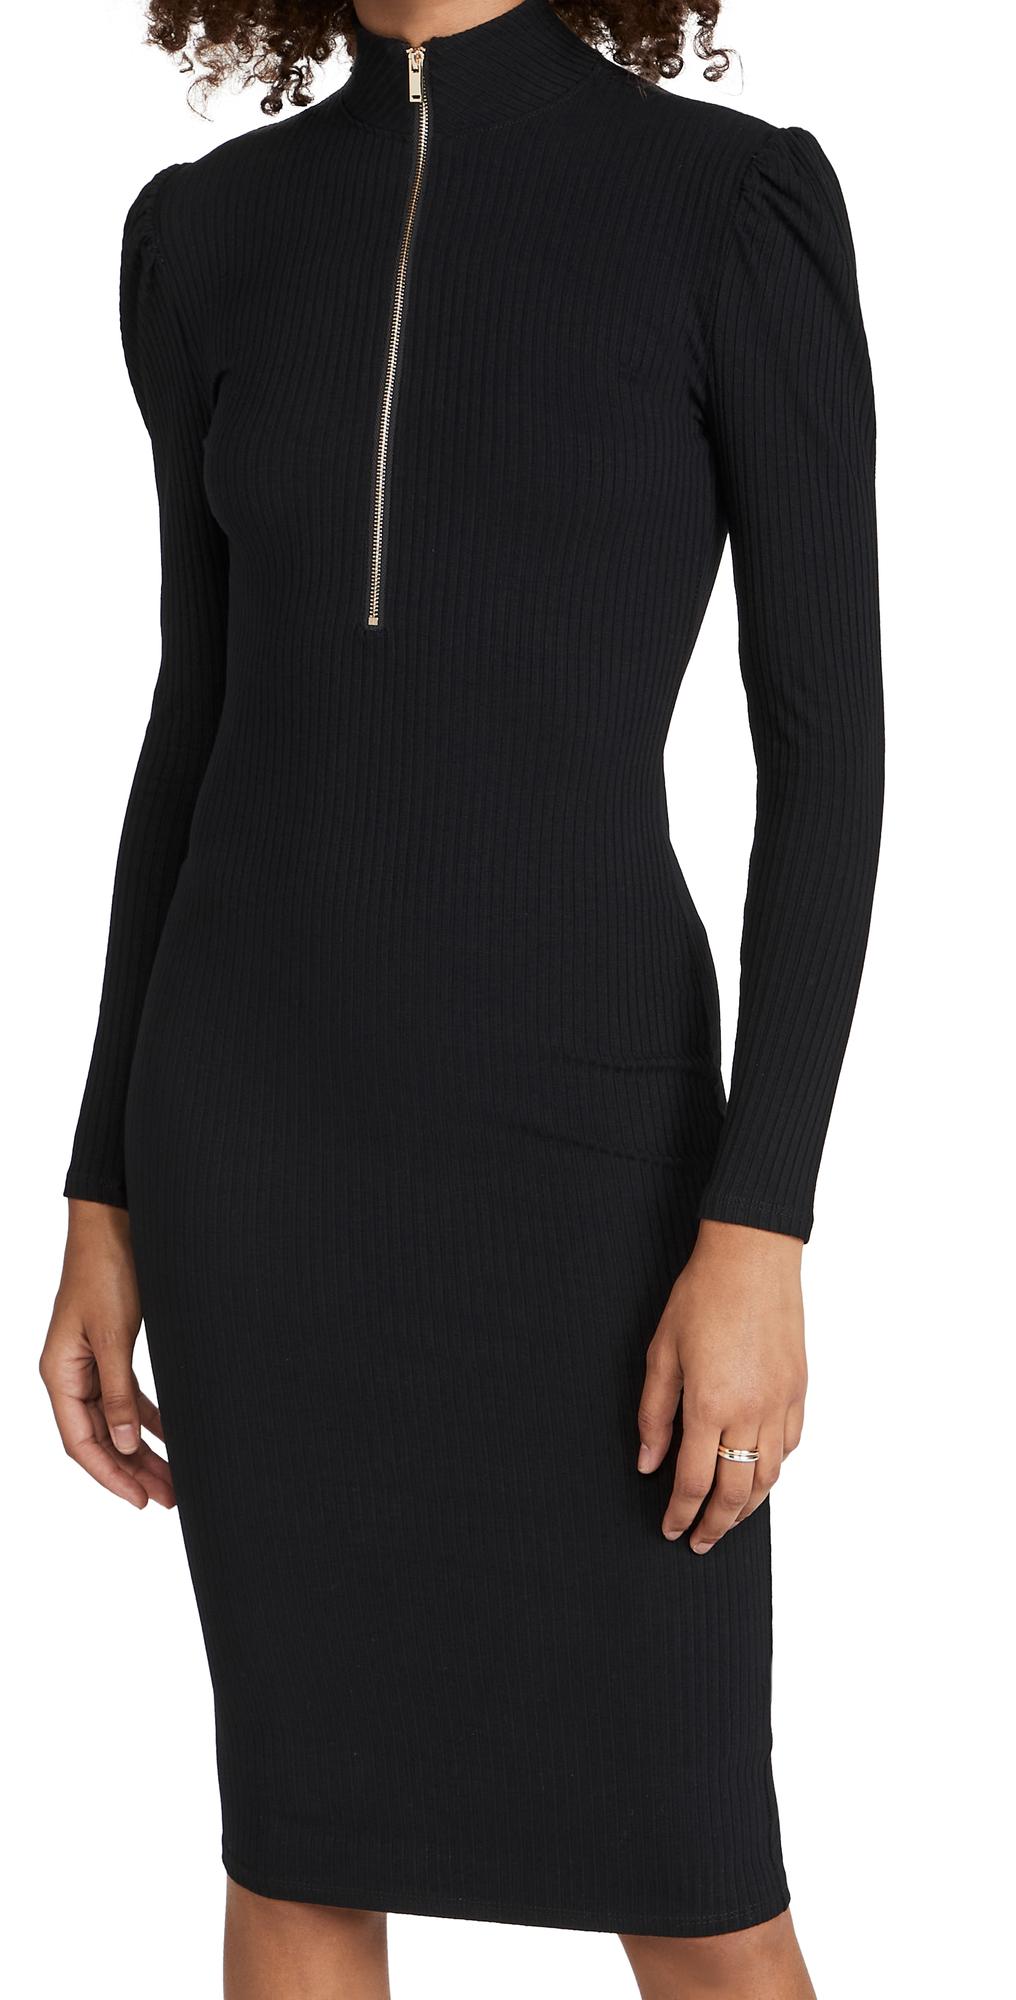 Oris Zipper Dress